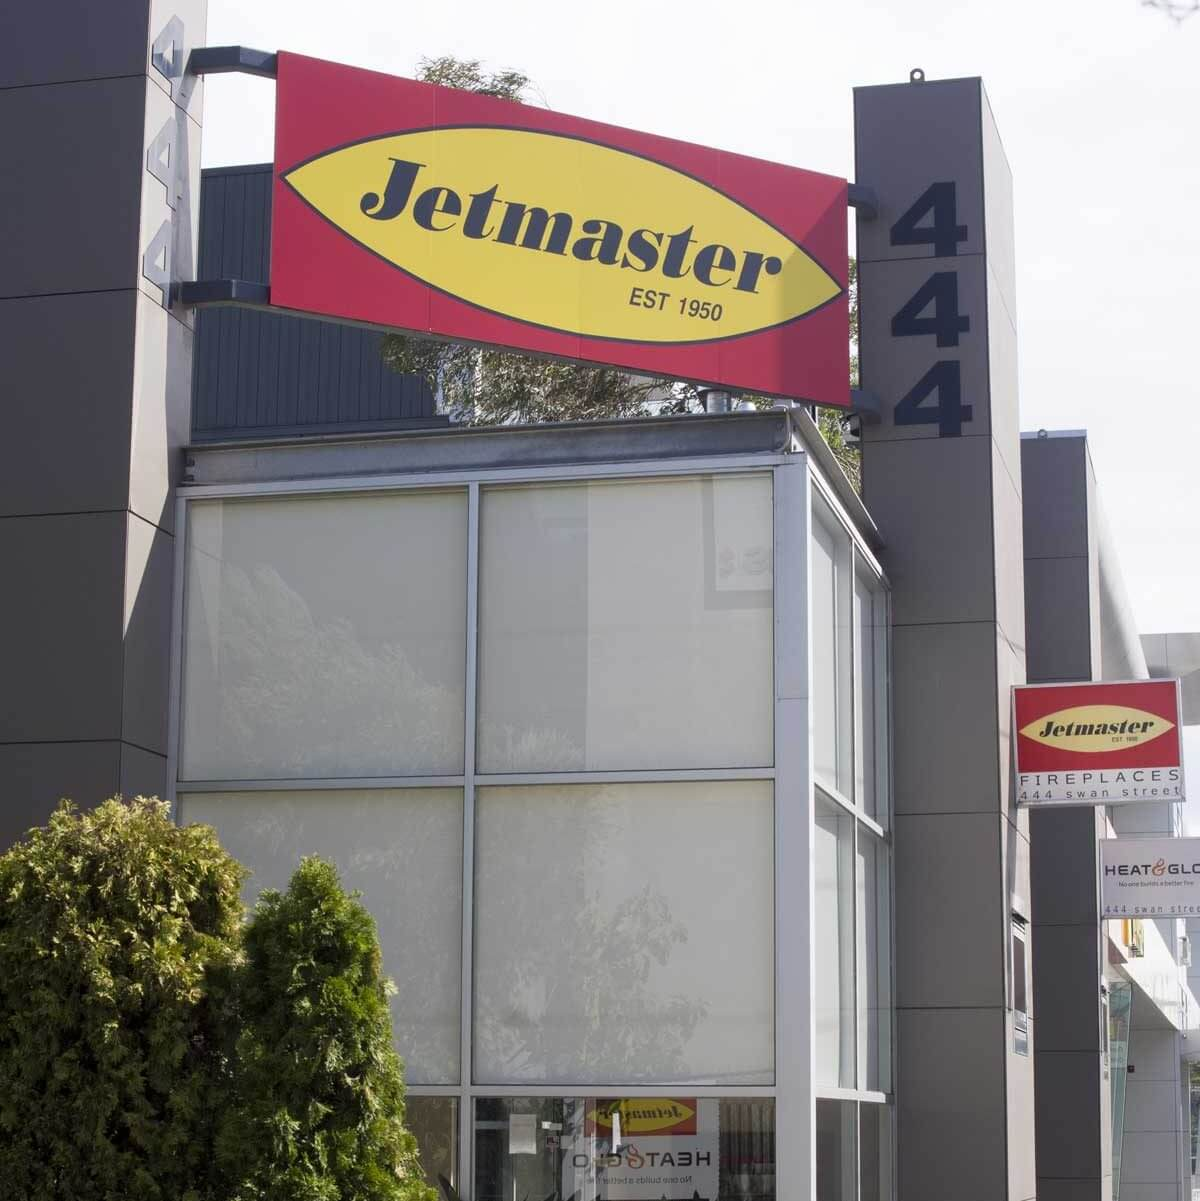 Jetmaster-street